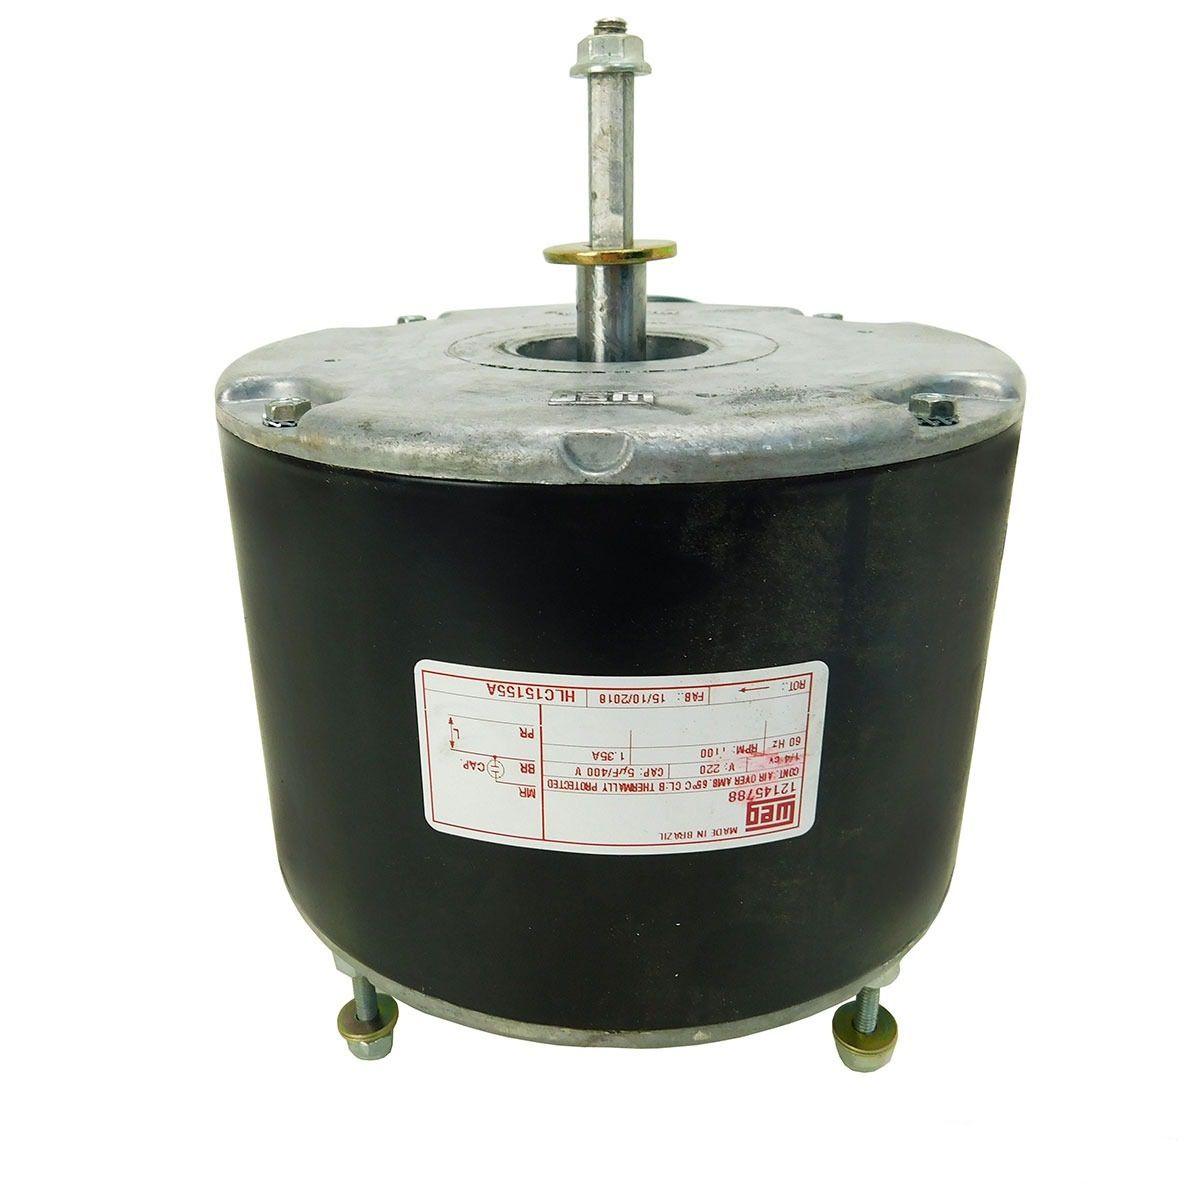 Motor Ventilador Condensadora Hitachi Modelos RAP 36.000 até 60.000 Btus D43346A